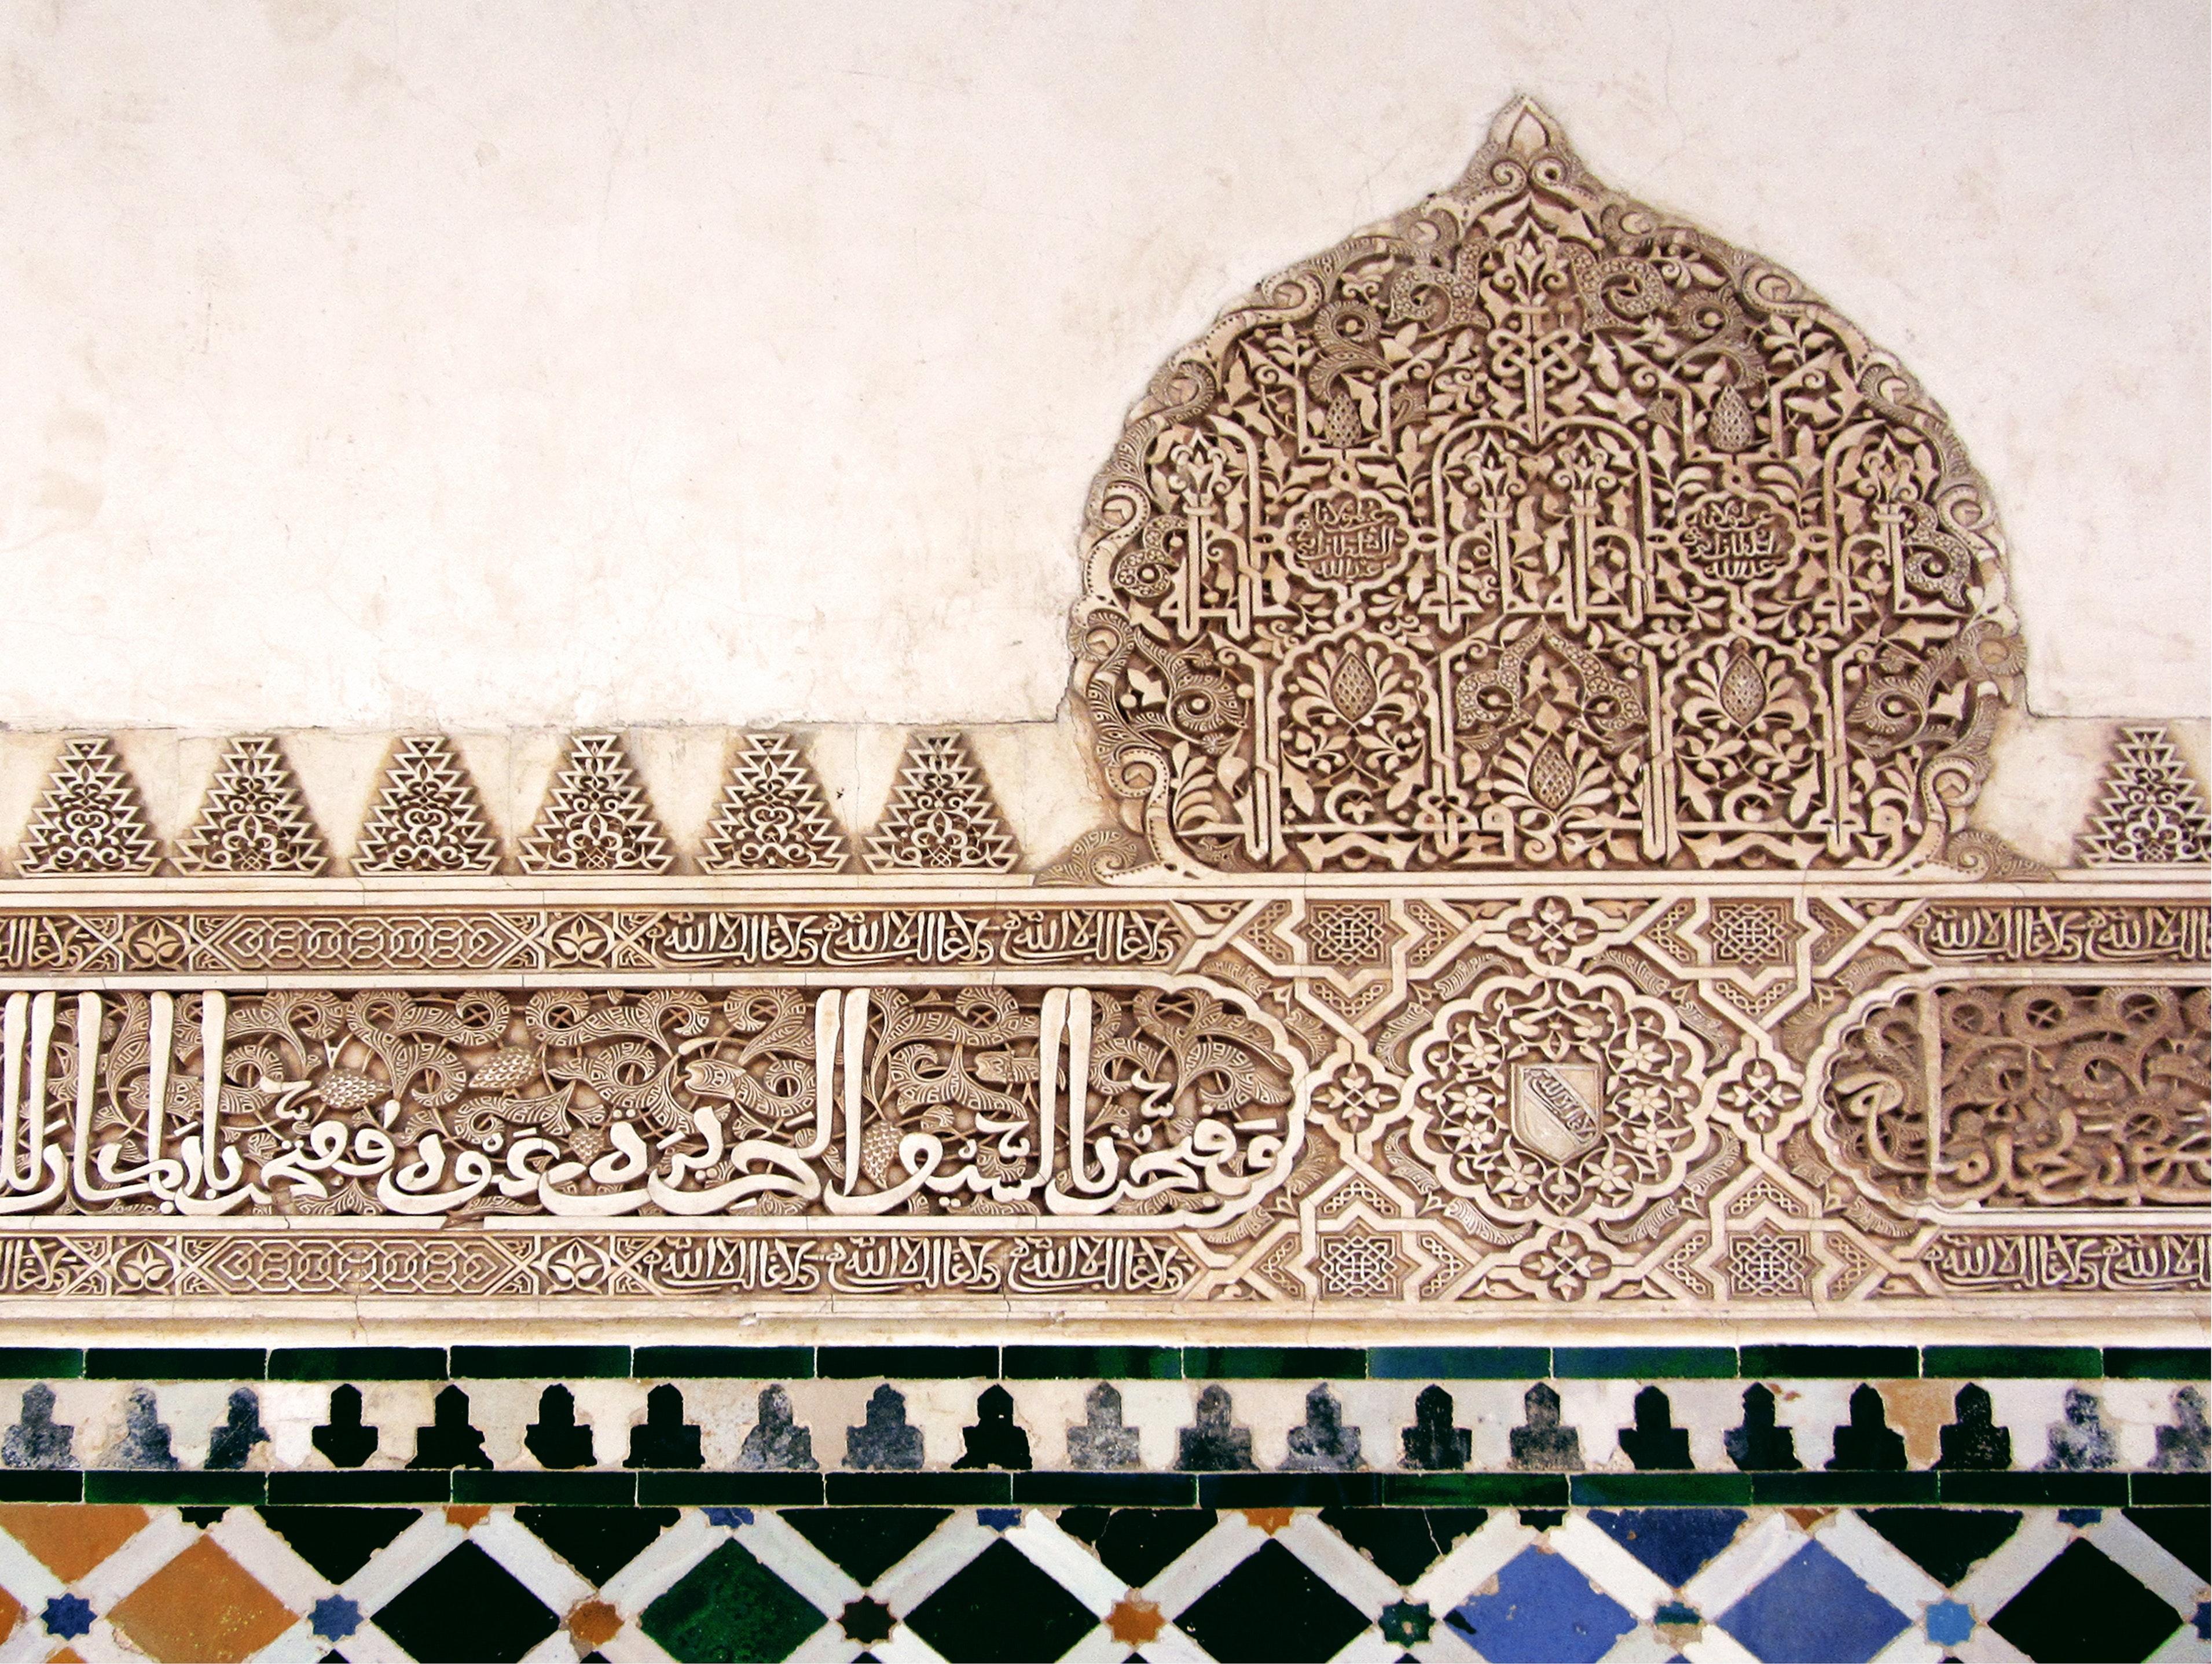 Musica Arabo-andalusa